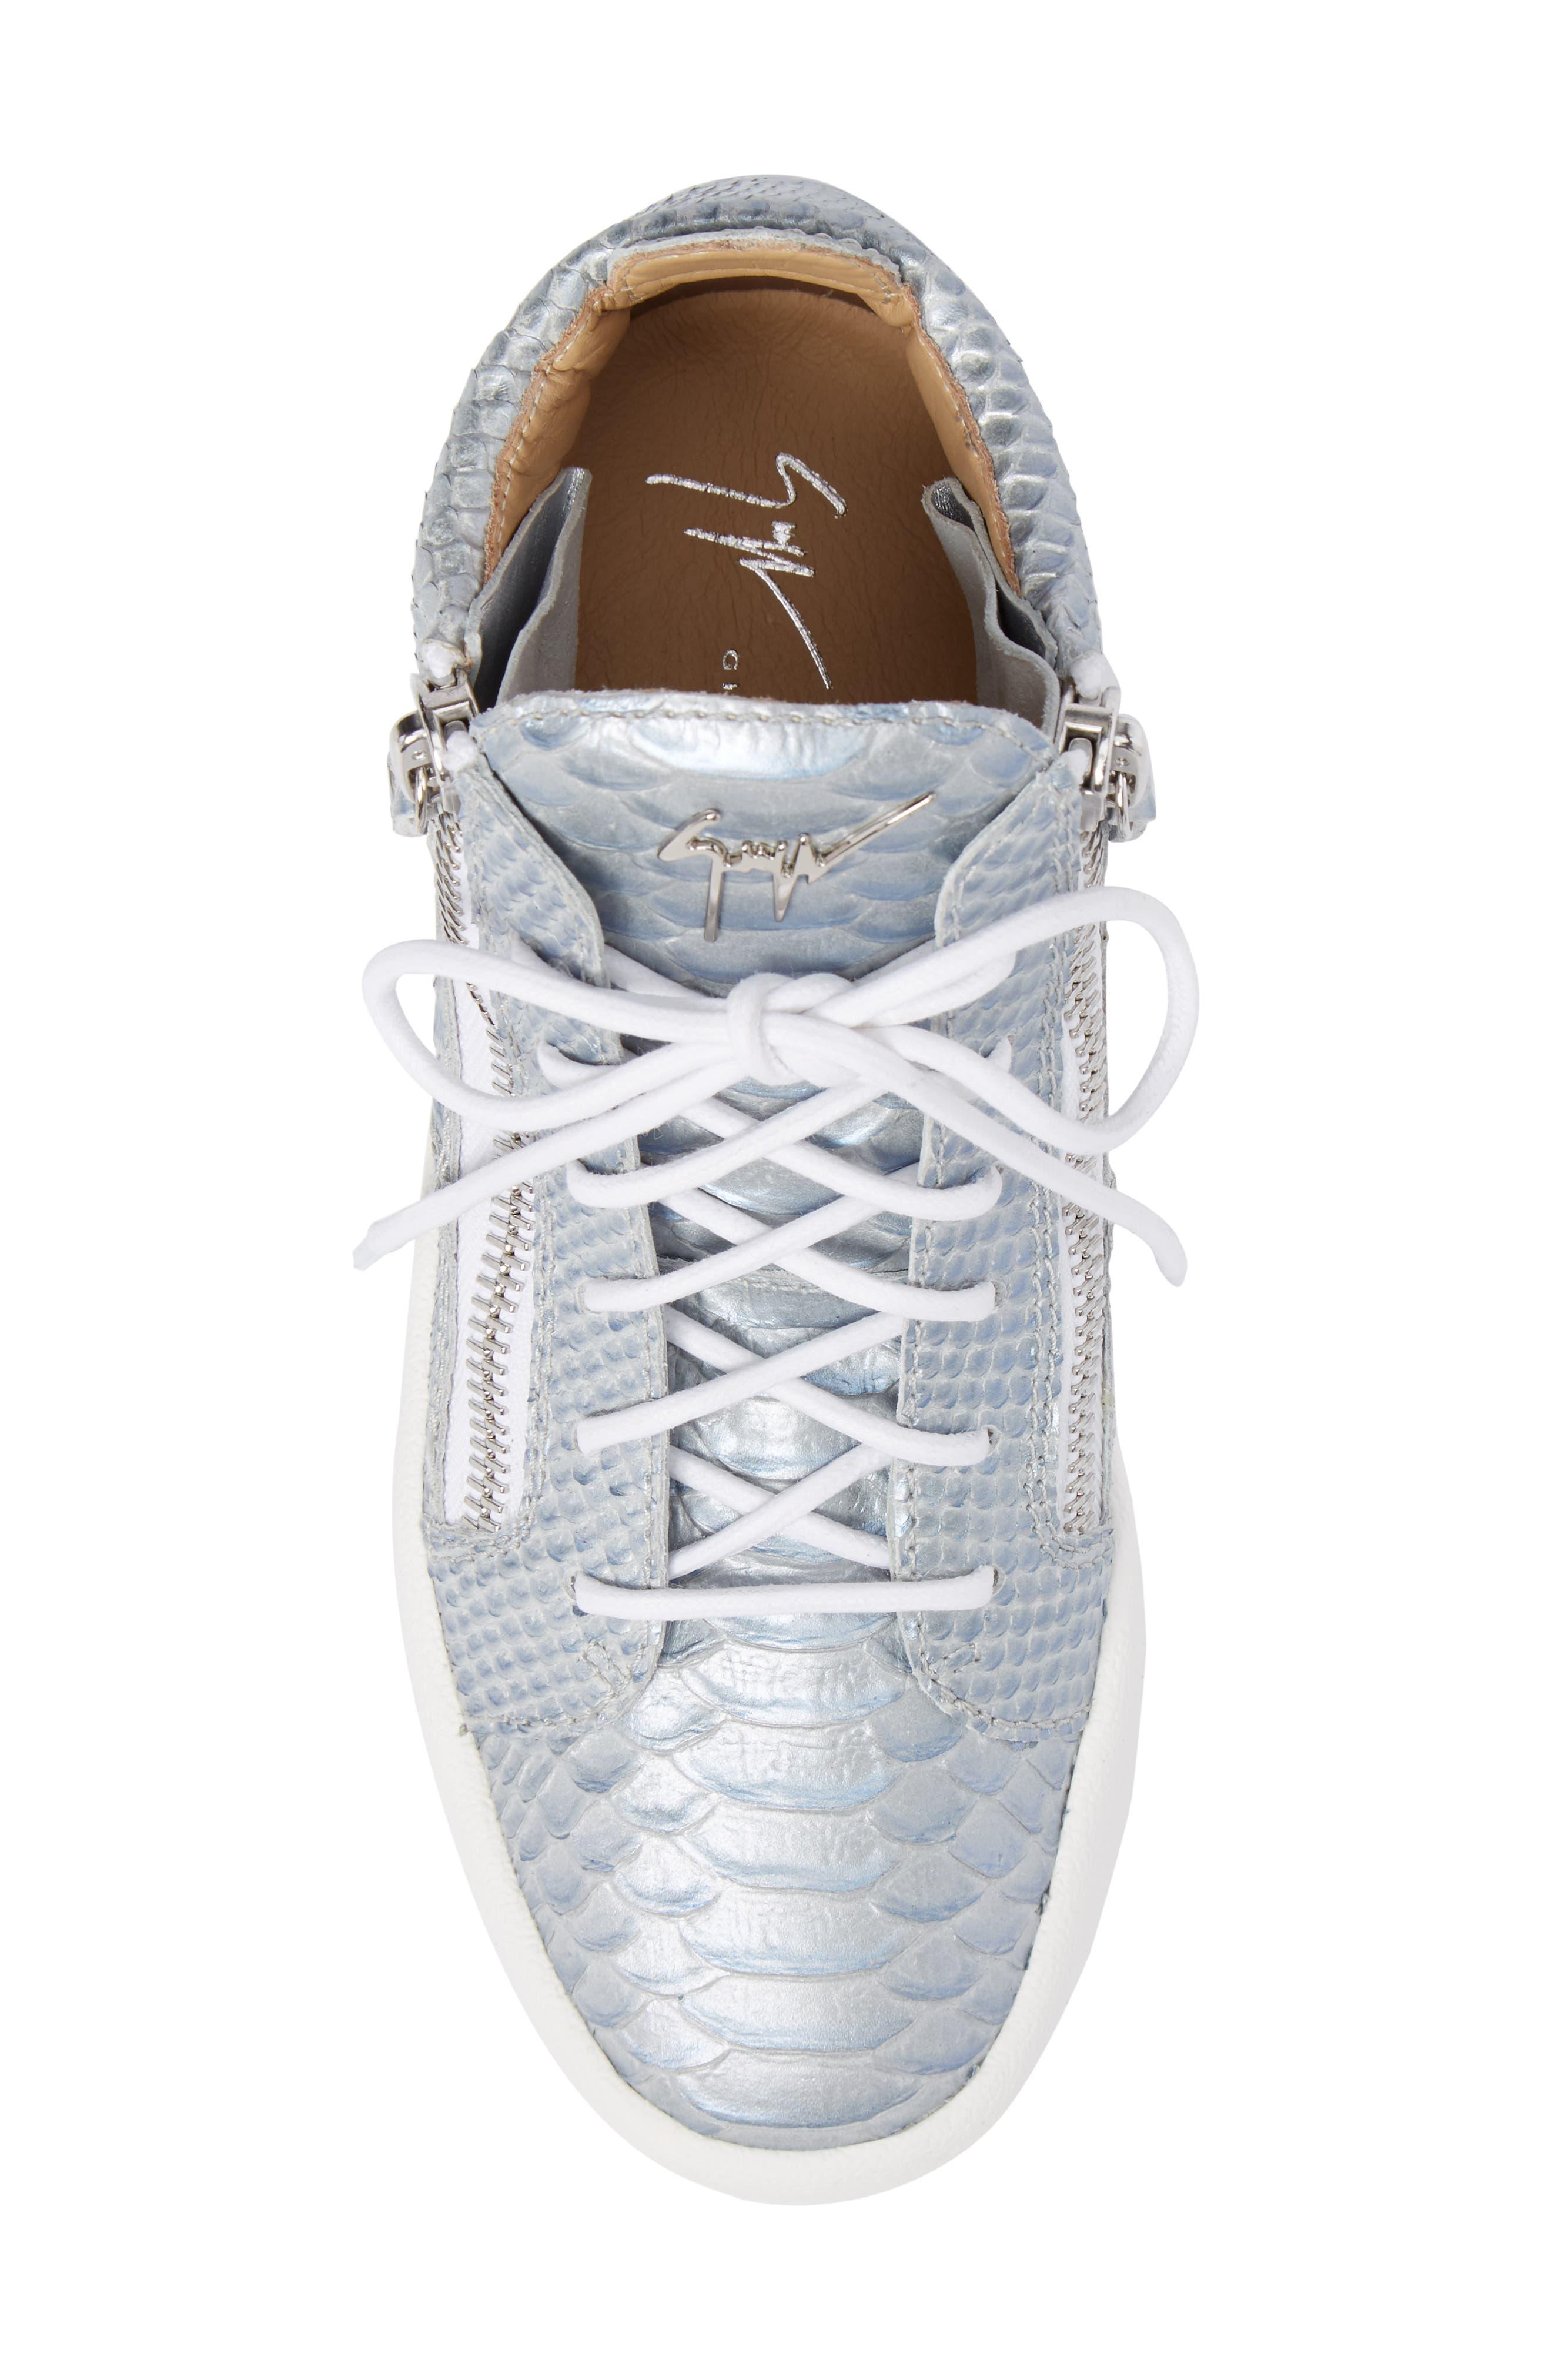 May London Mid Top Sneaker,                             Alternate thumbnail 5, color,                             020